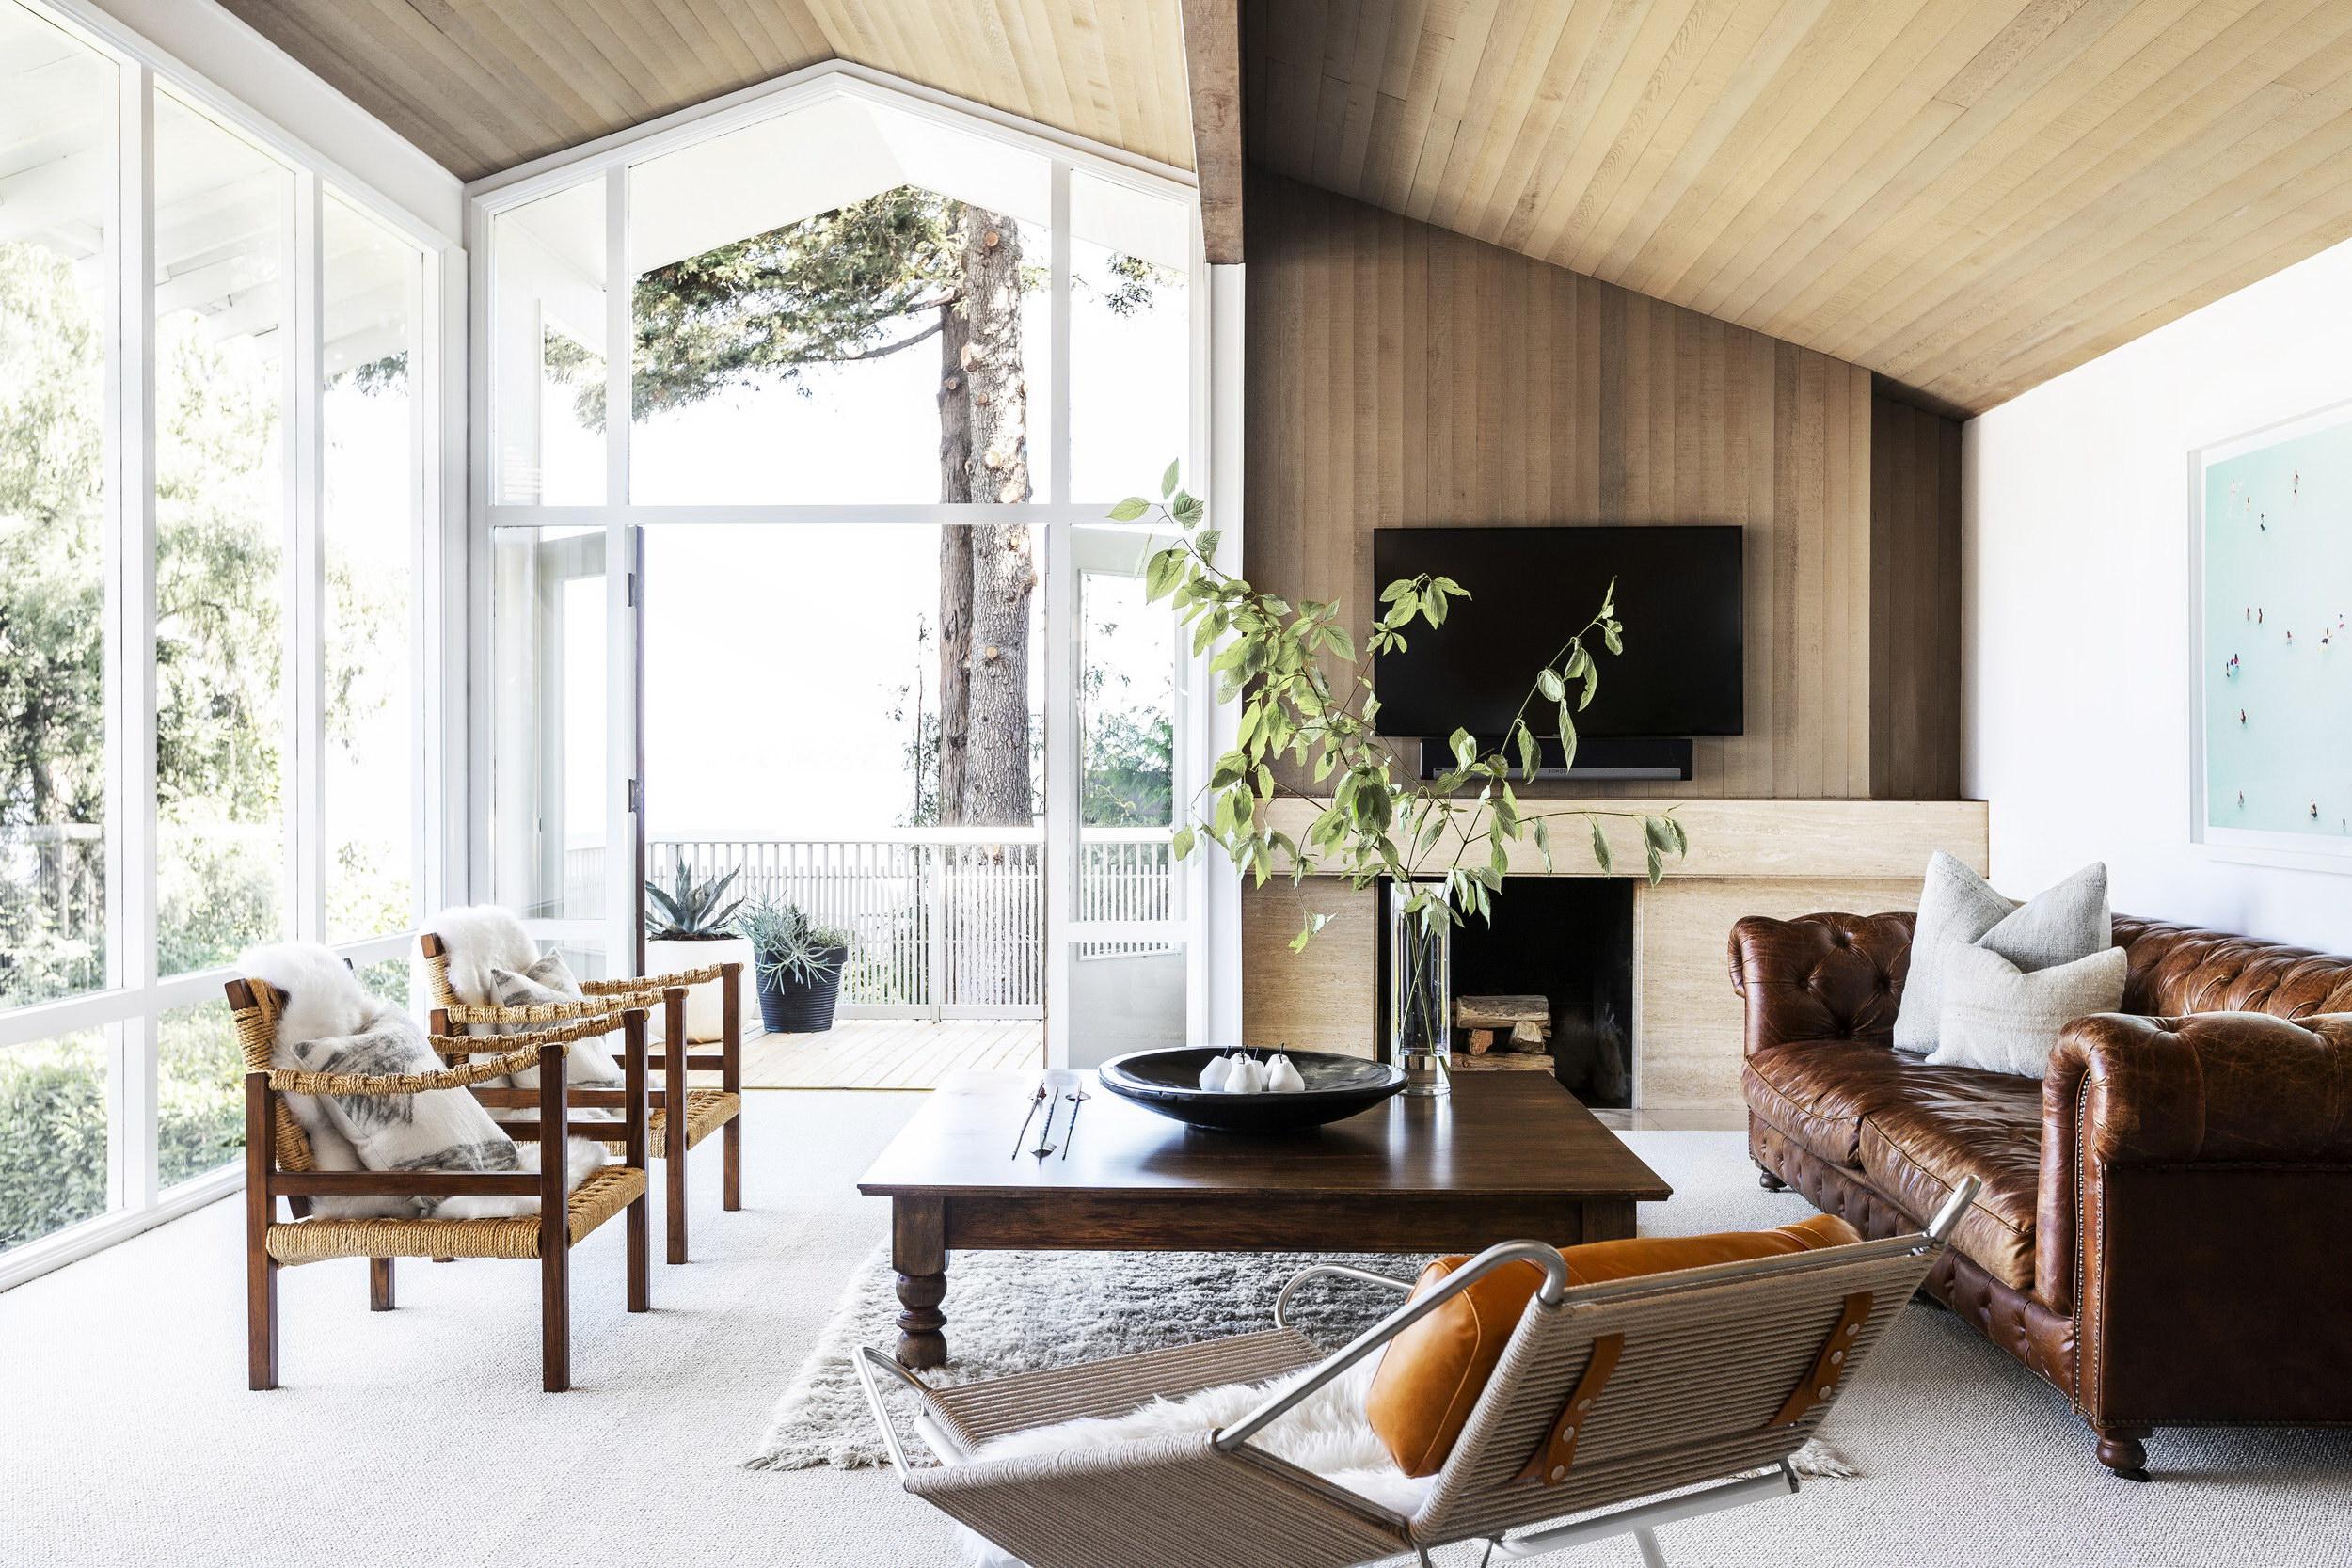 Mercer Modern | Revamped Mid-Century Home by Wittman Estes